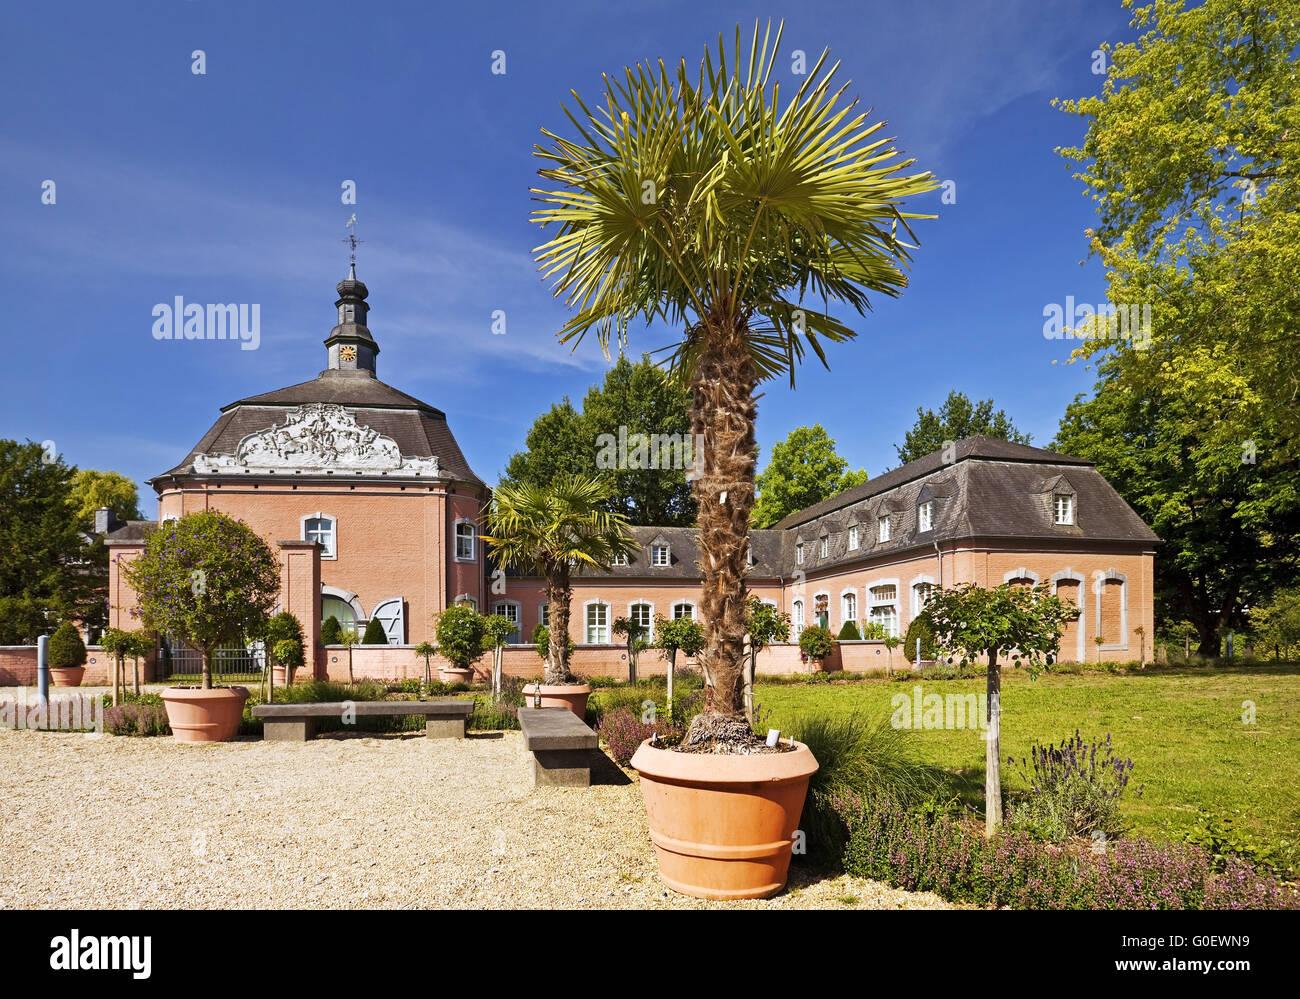 Castle Wickrath, Moenchengladbach, Germany - Stock Image